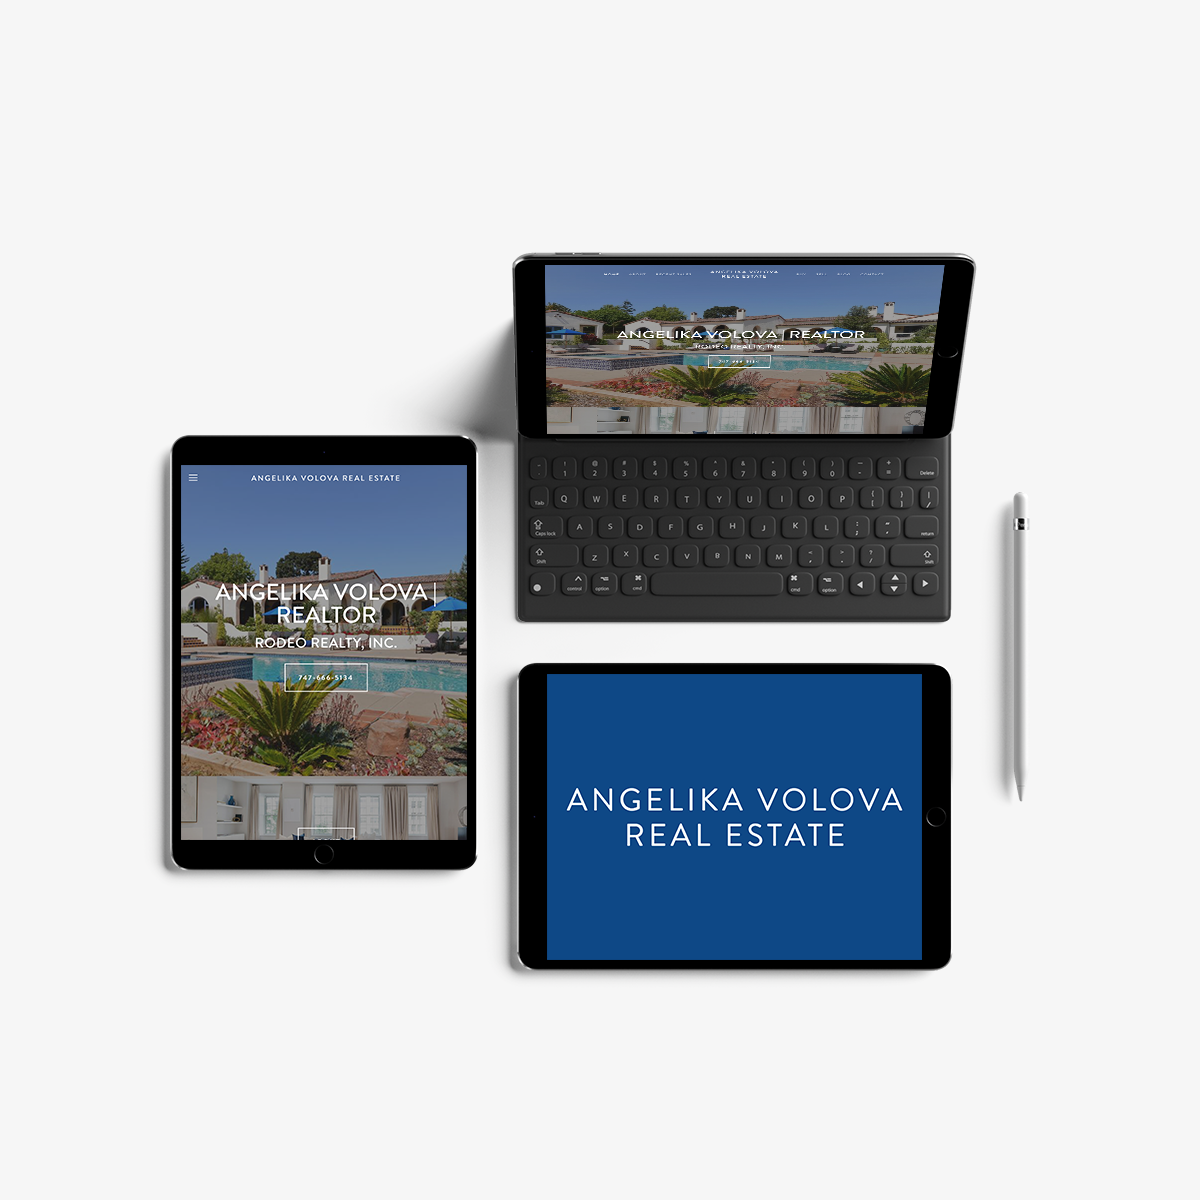 Angelika Volova Real Estate